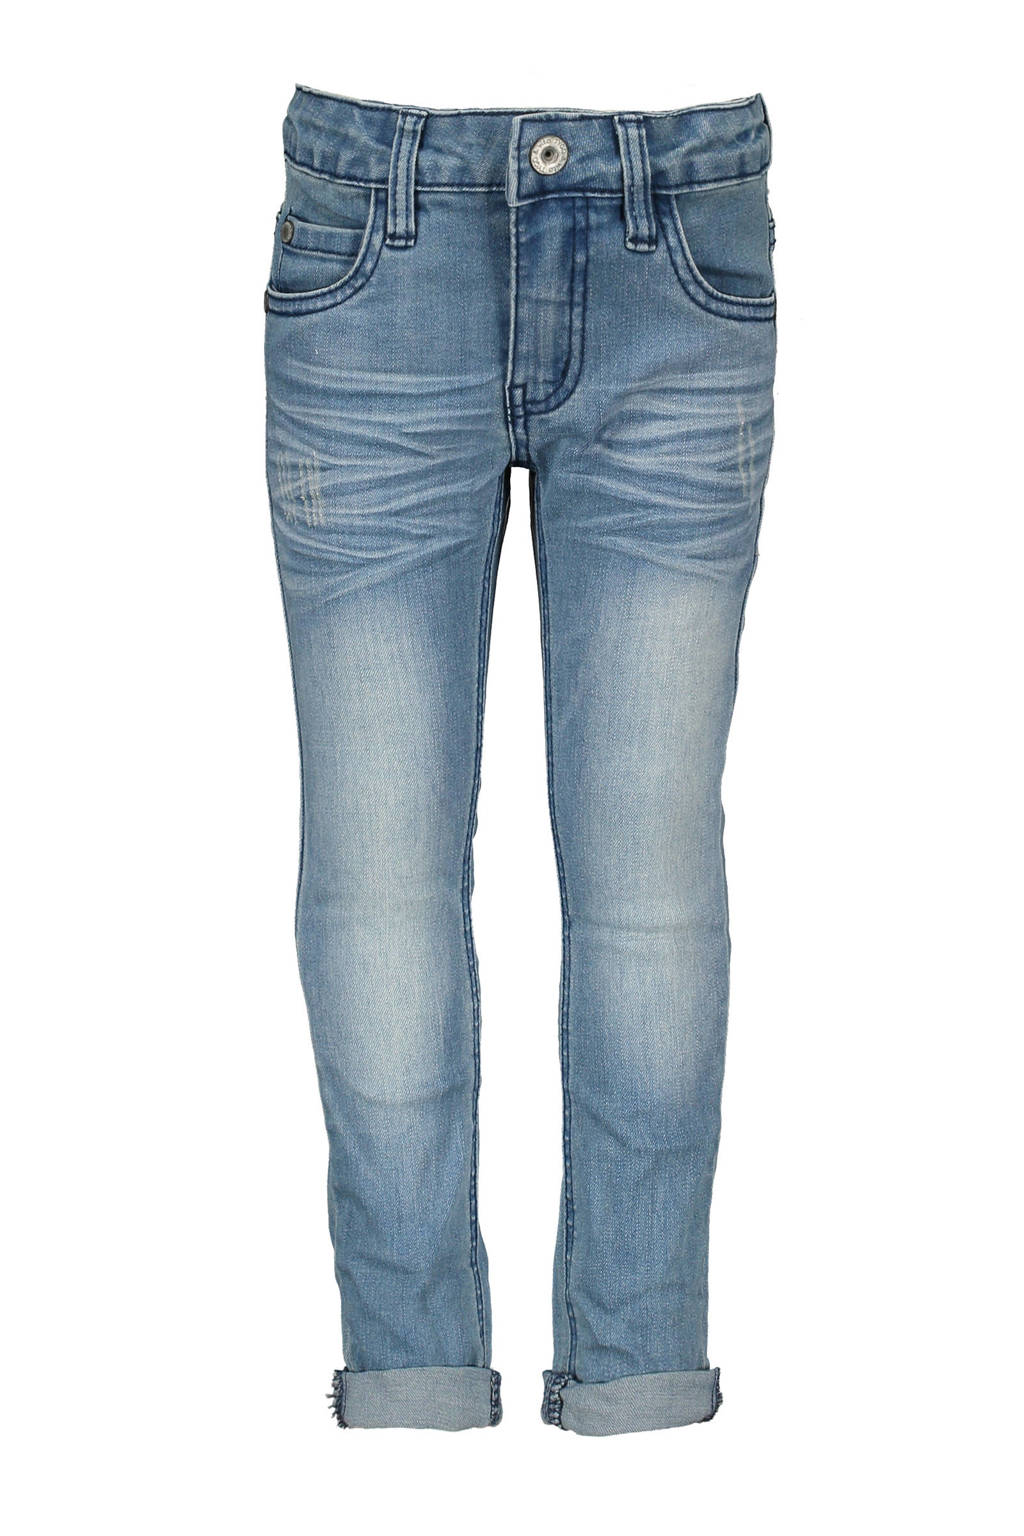 TYGO & vito jeans, Light denim vintage